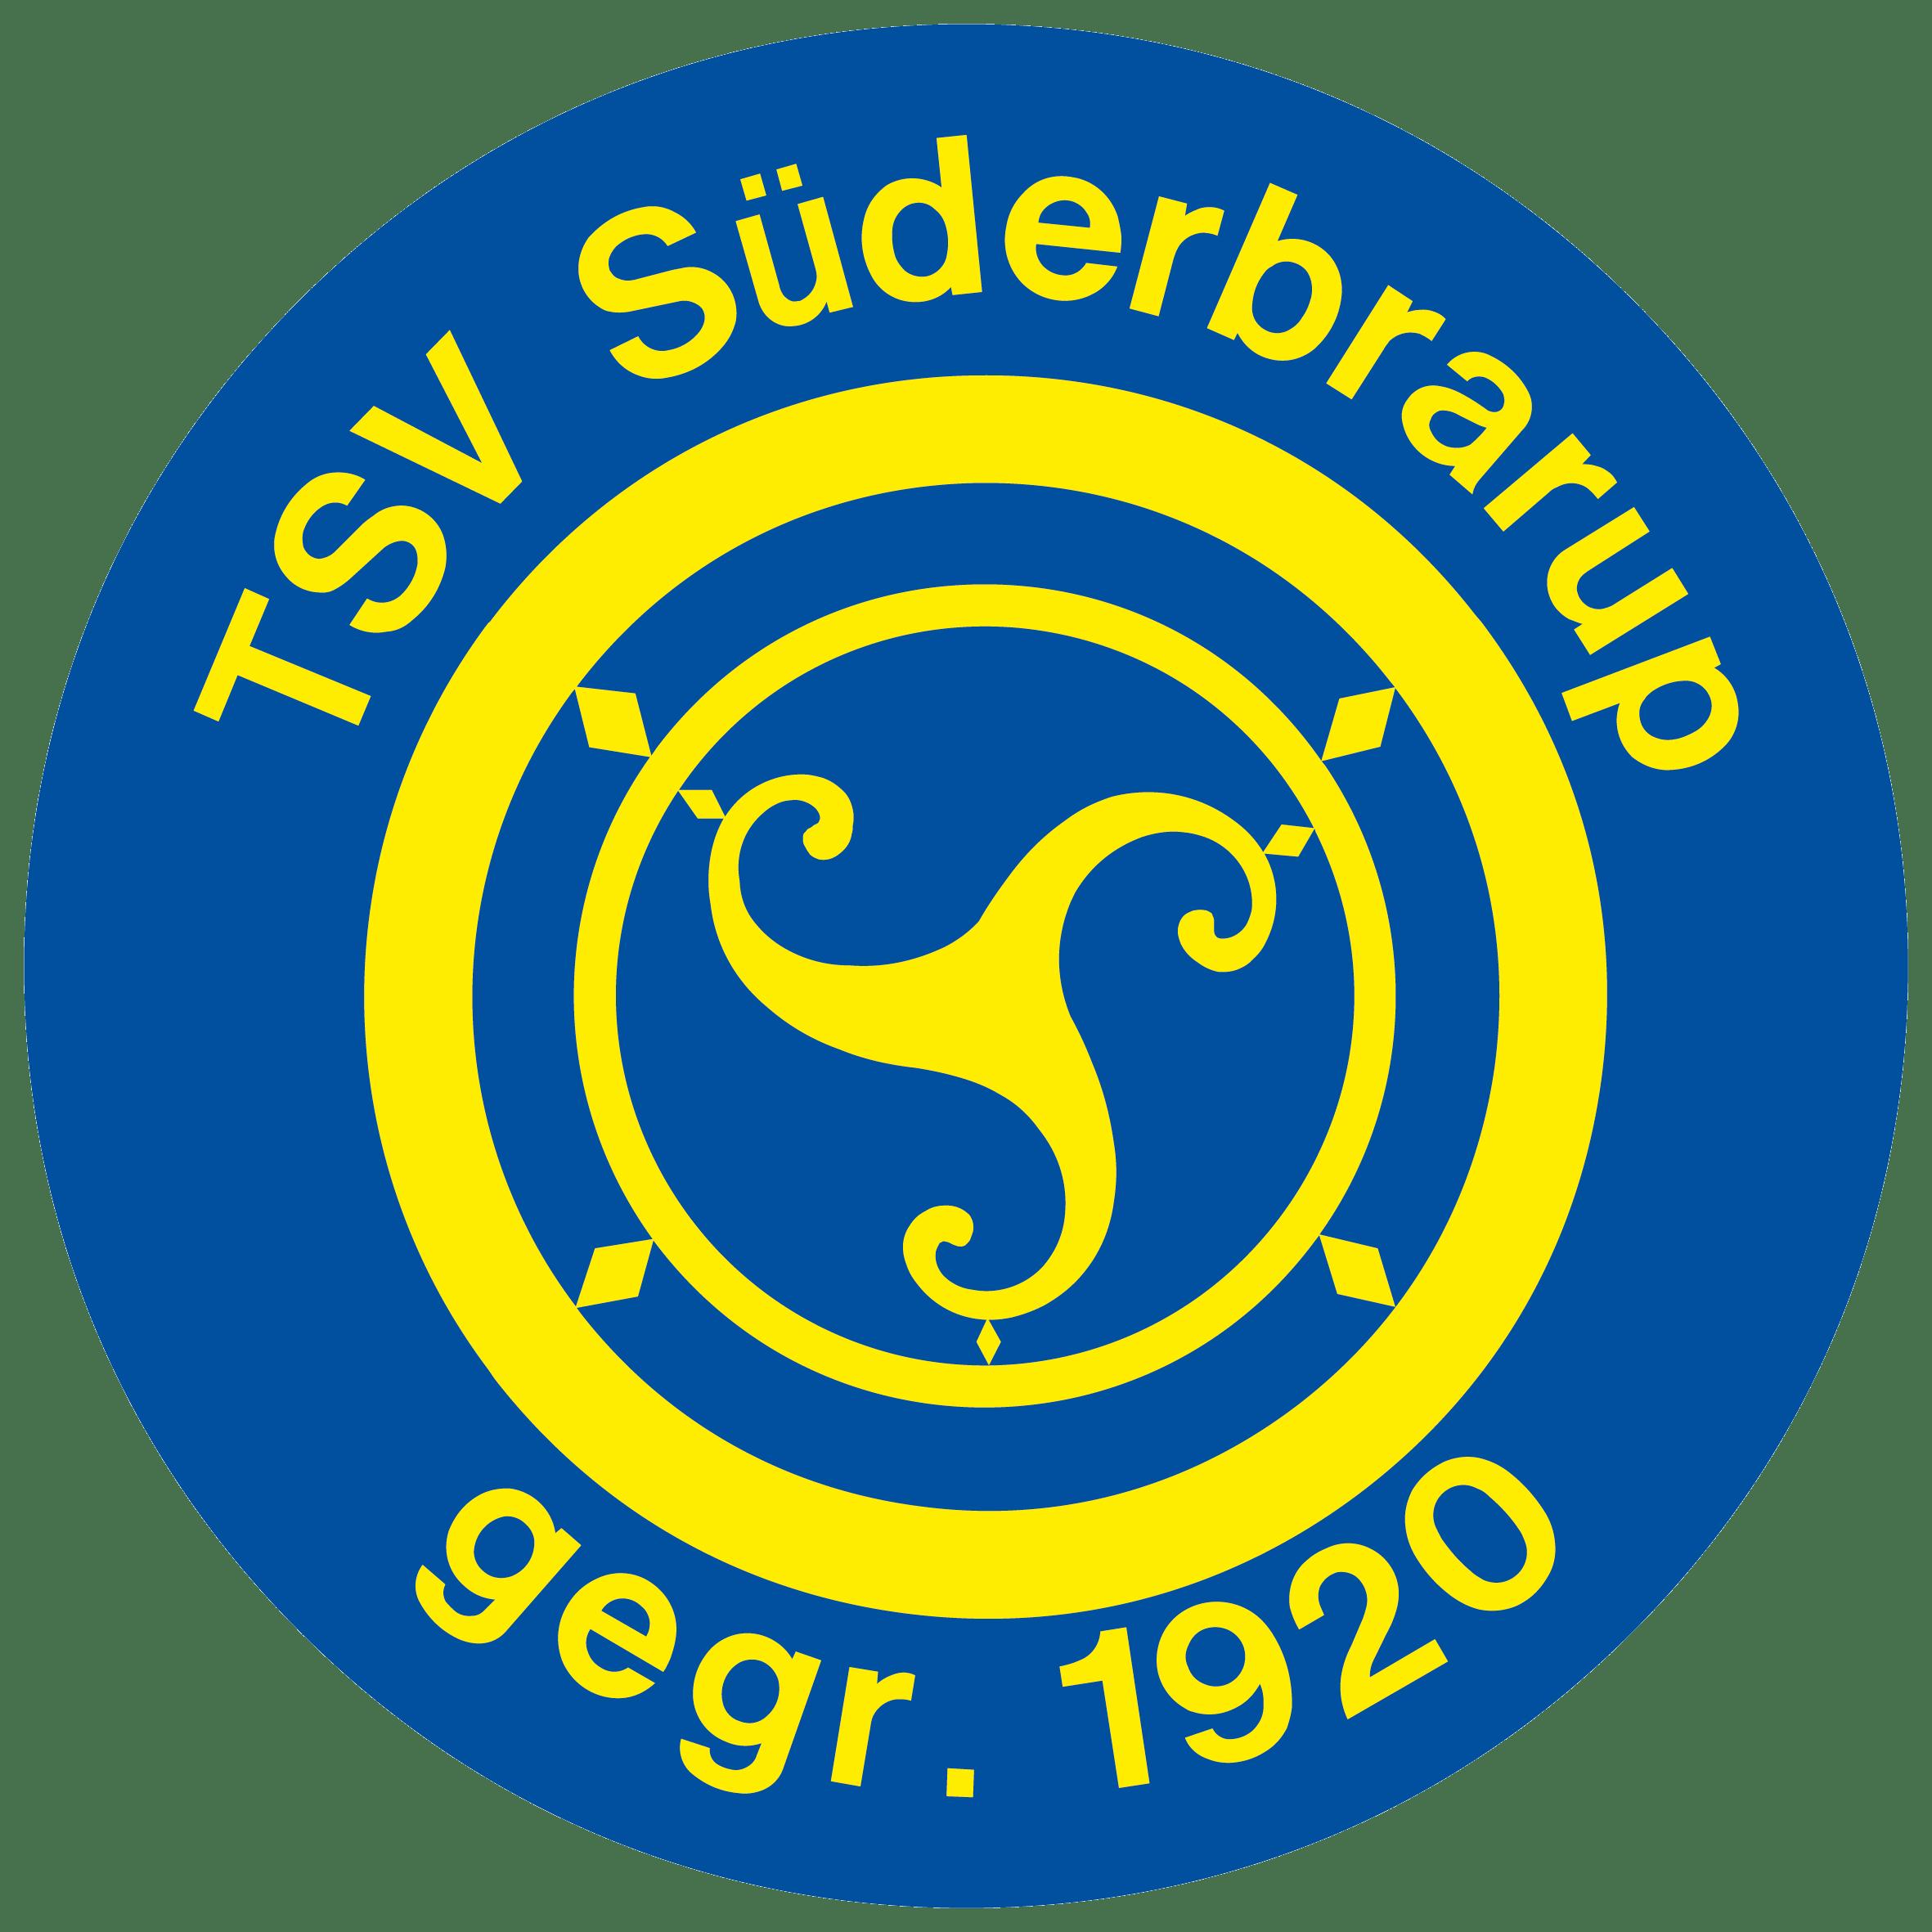 TSV Jahreshauptversammlung